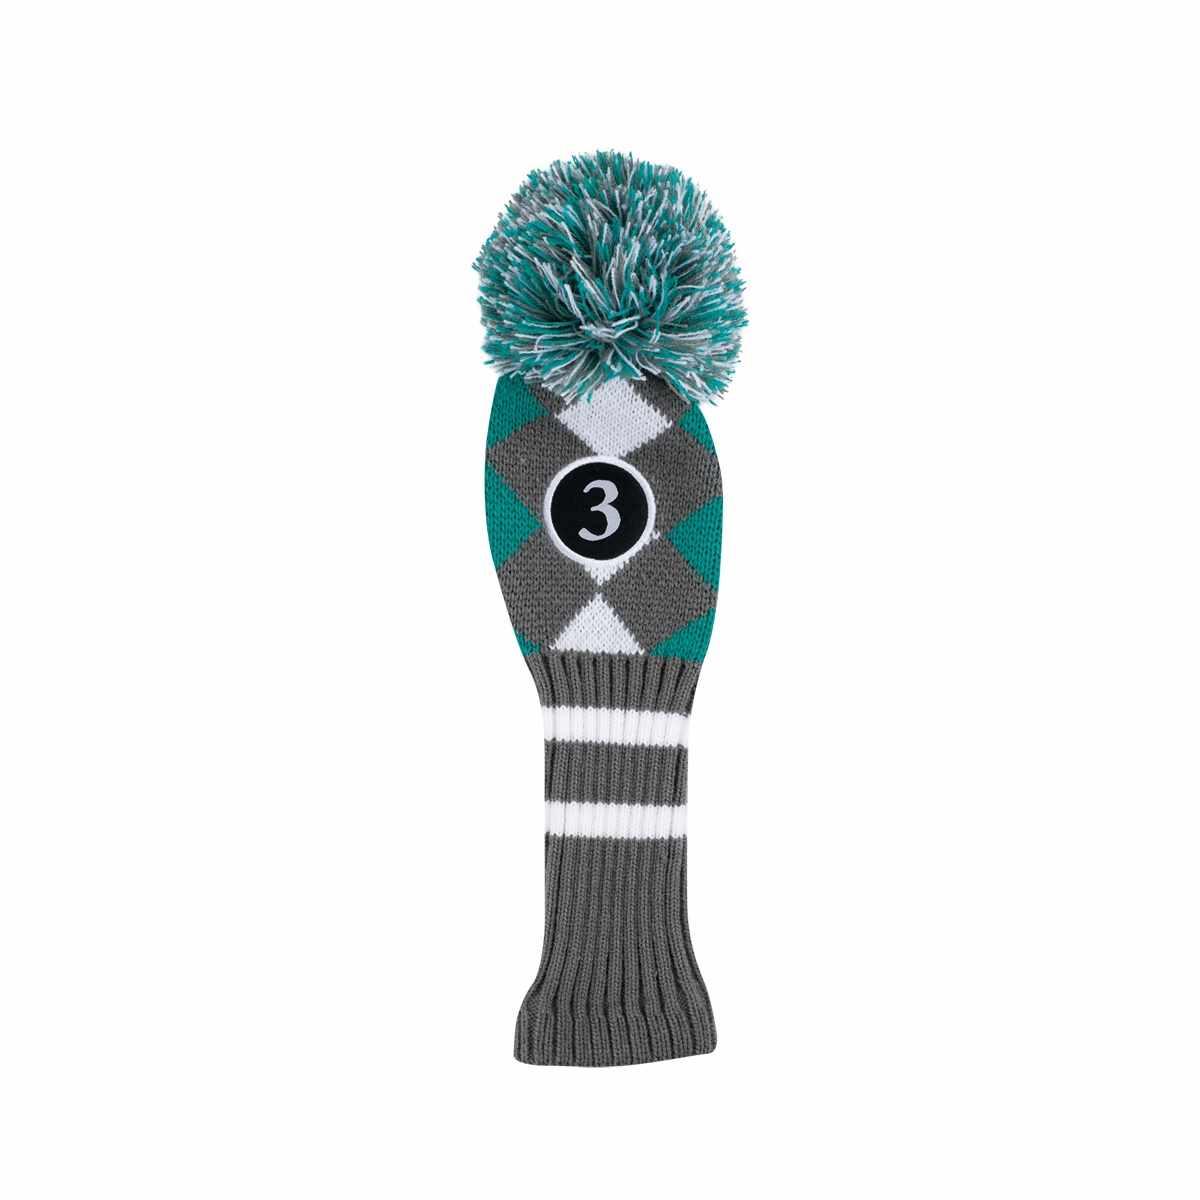 Callaway Golf Pom-Pom Headcover ( 3) Charcoal Teal White - Golfland ... dd82ecd72e71